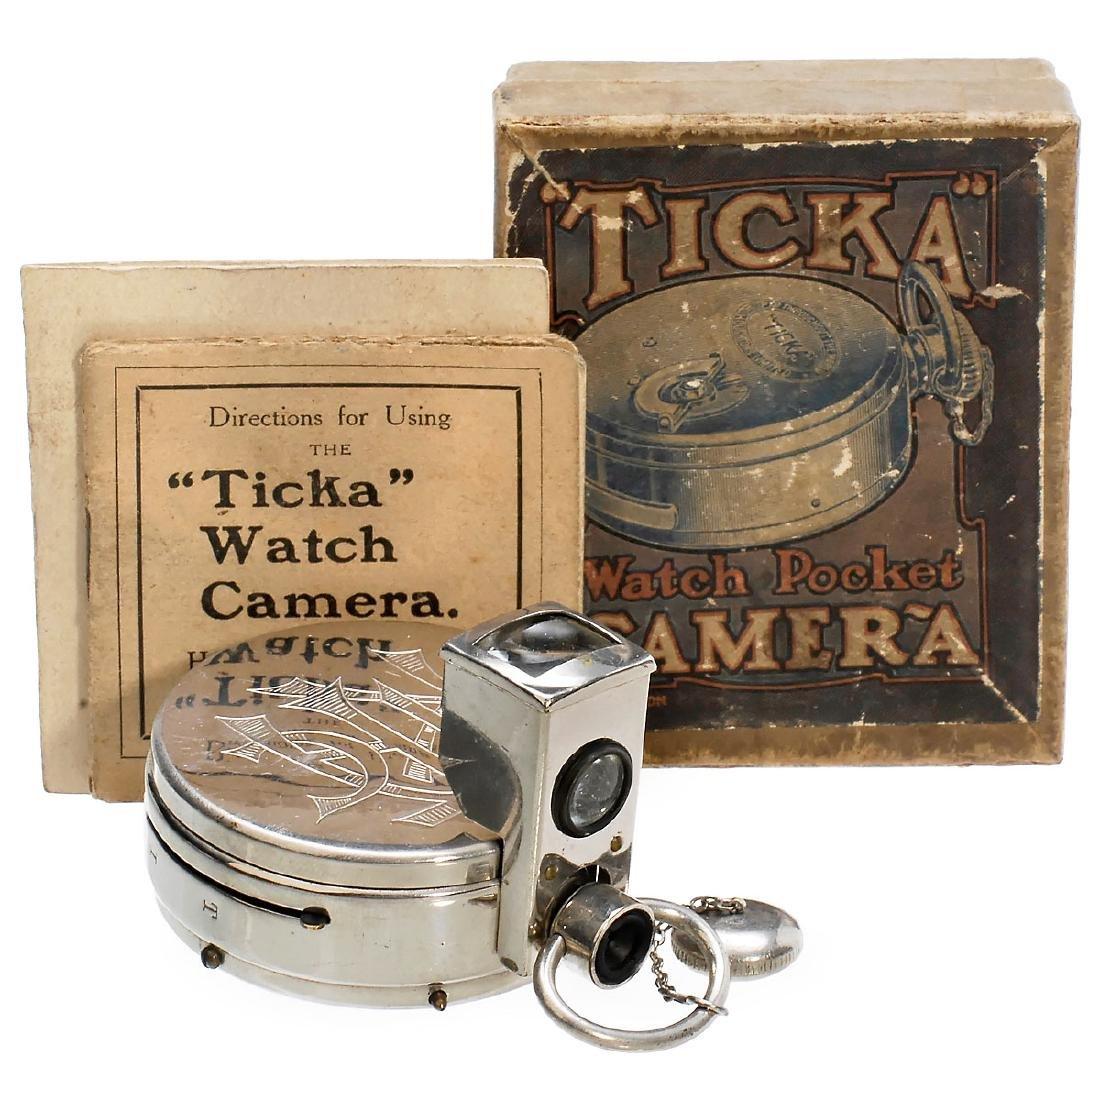 """Ticka"" Watch Pocket Camera with Original Box, 1905"